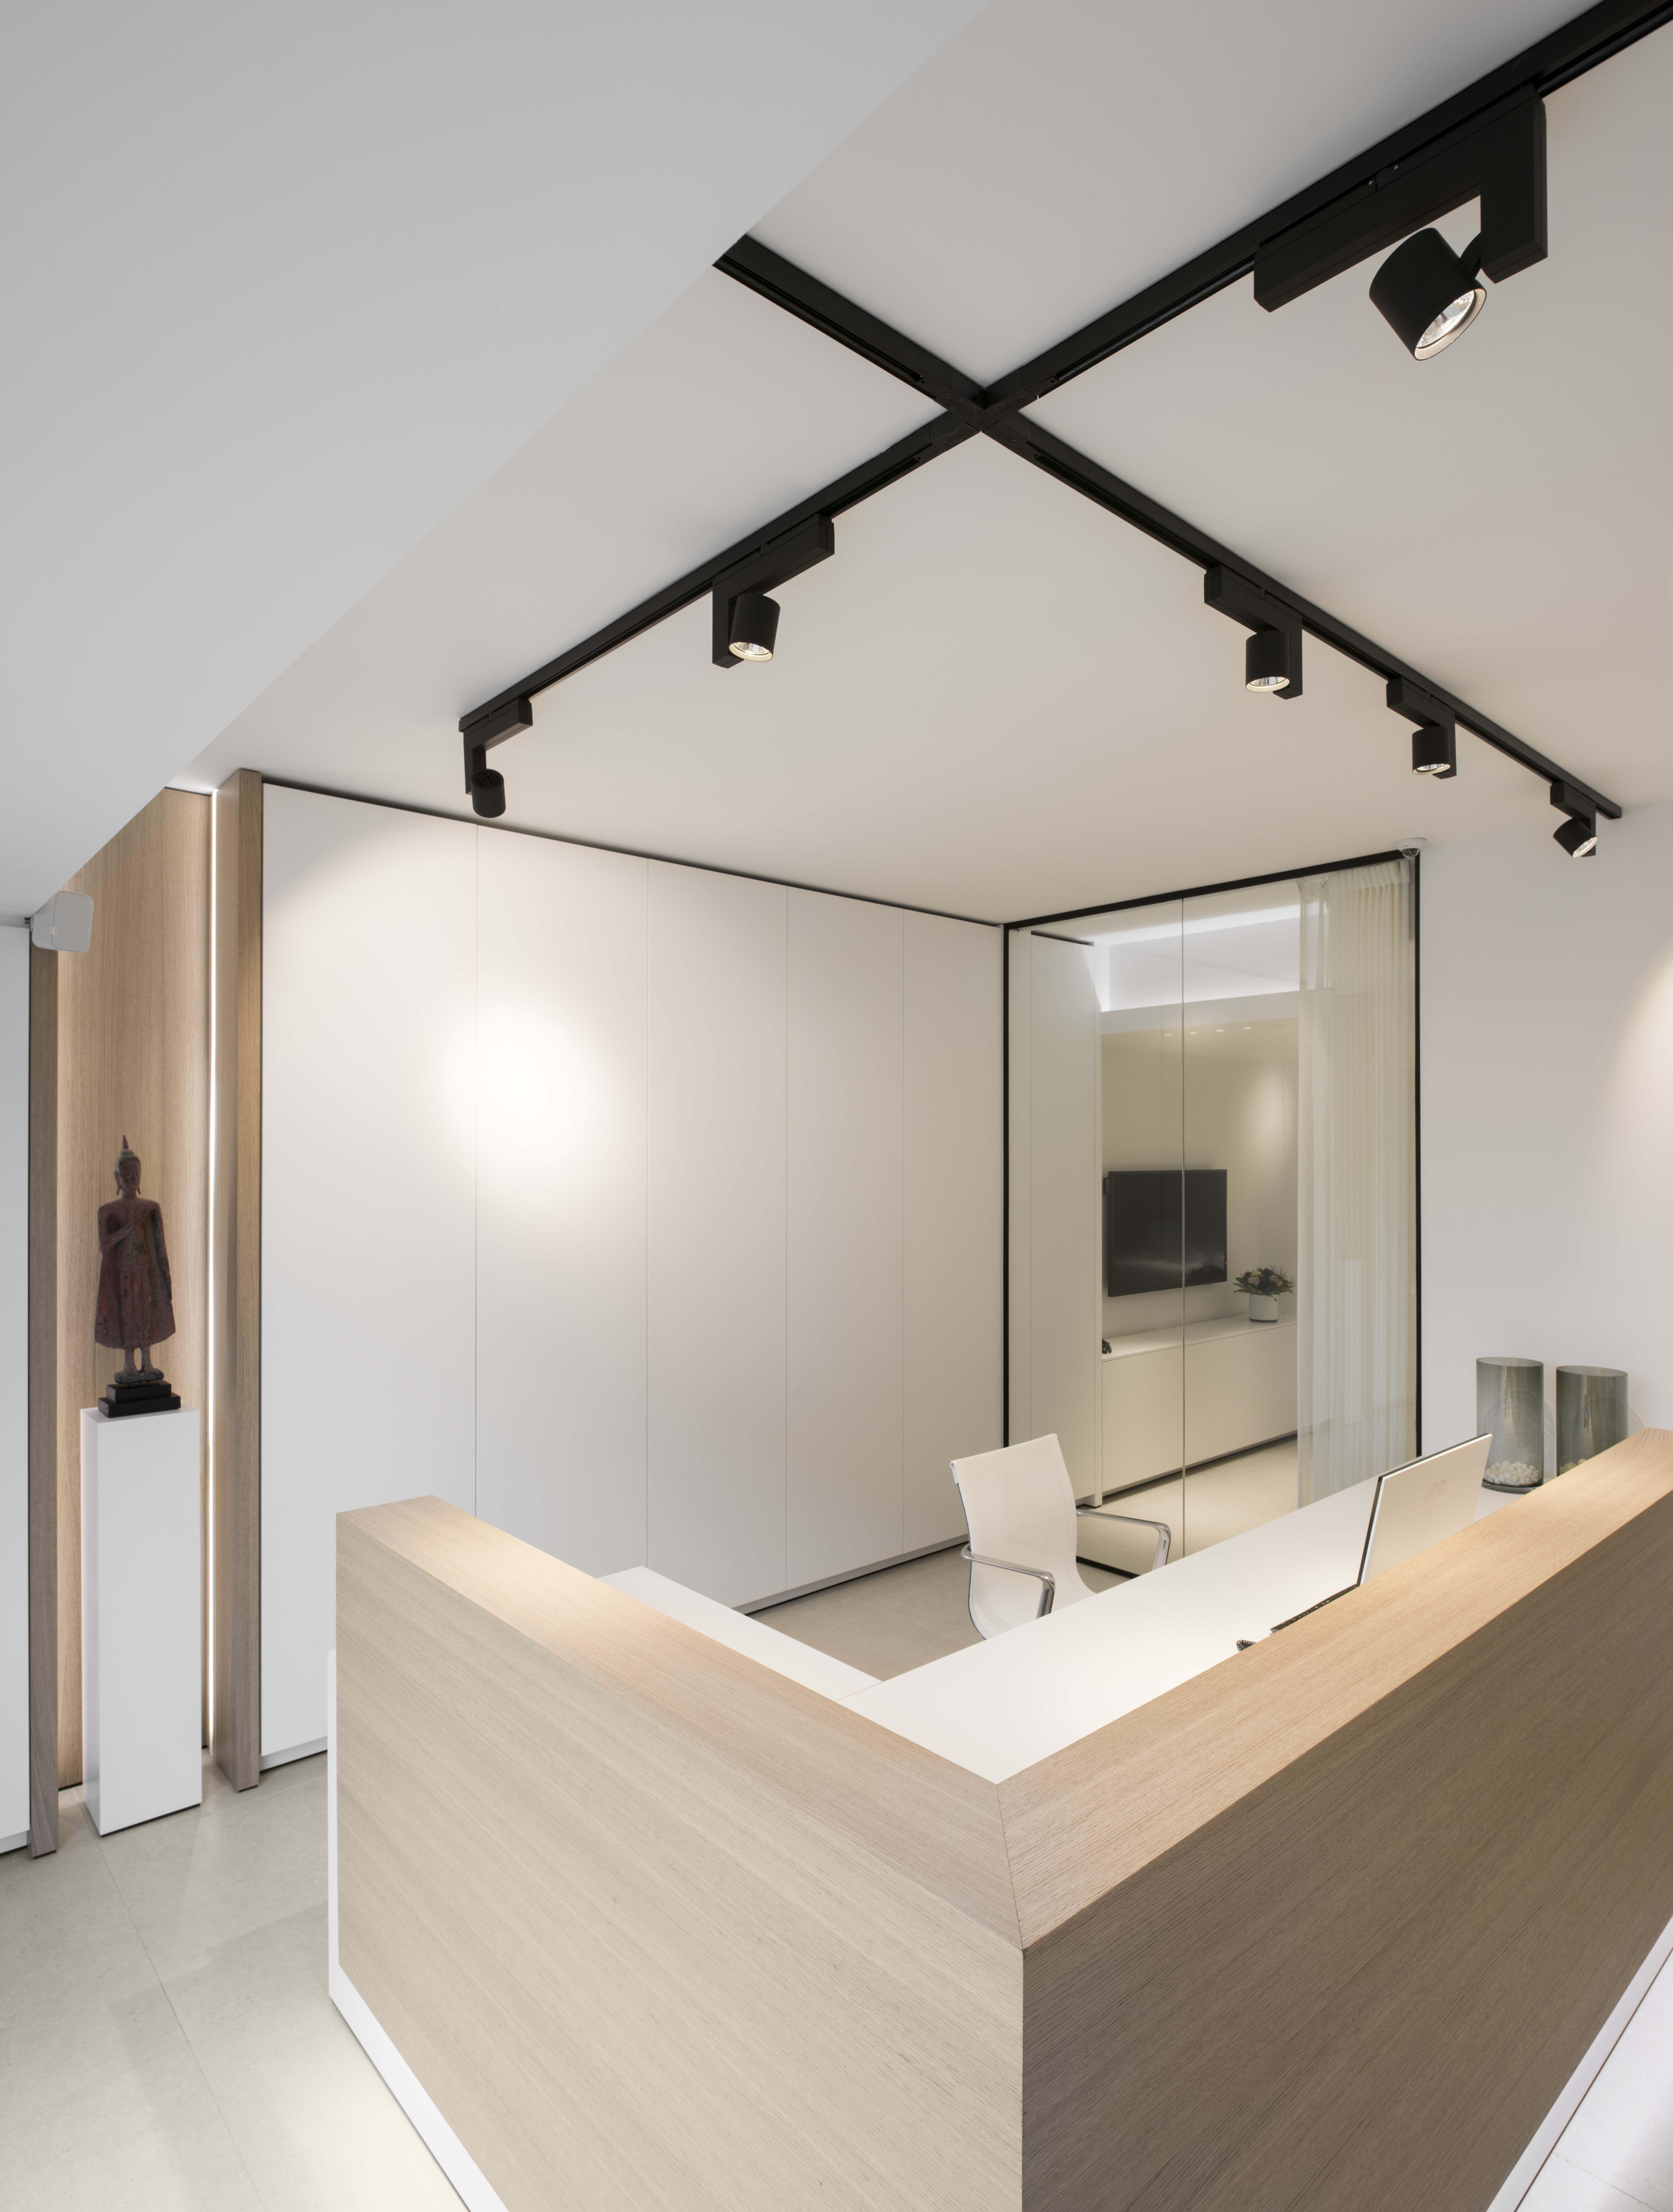 Office Track System Lighting Wood Erubo Led Kreon Kreonlighting